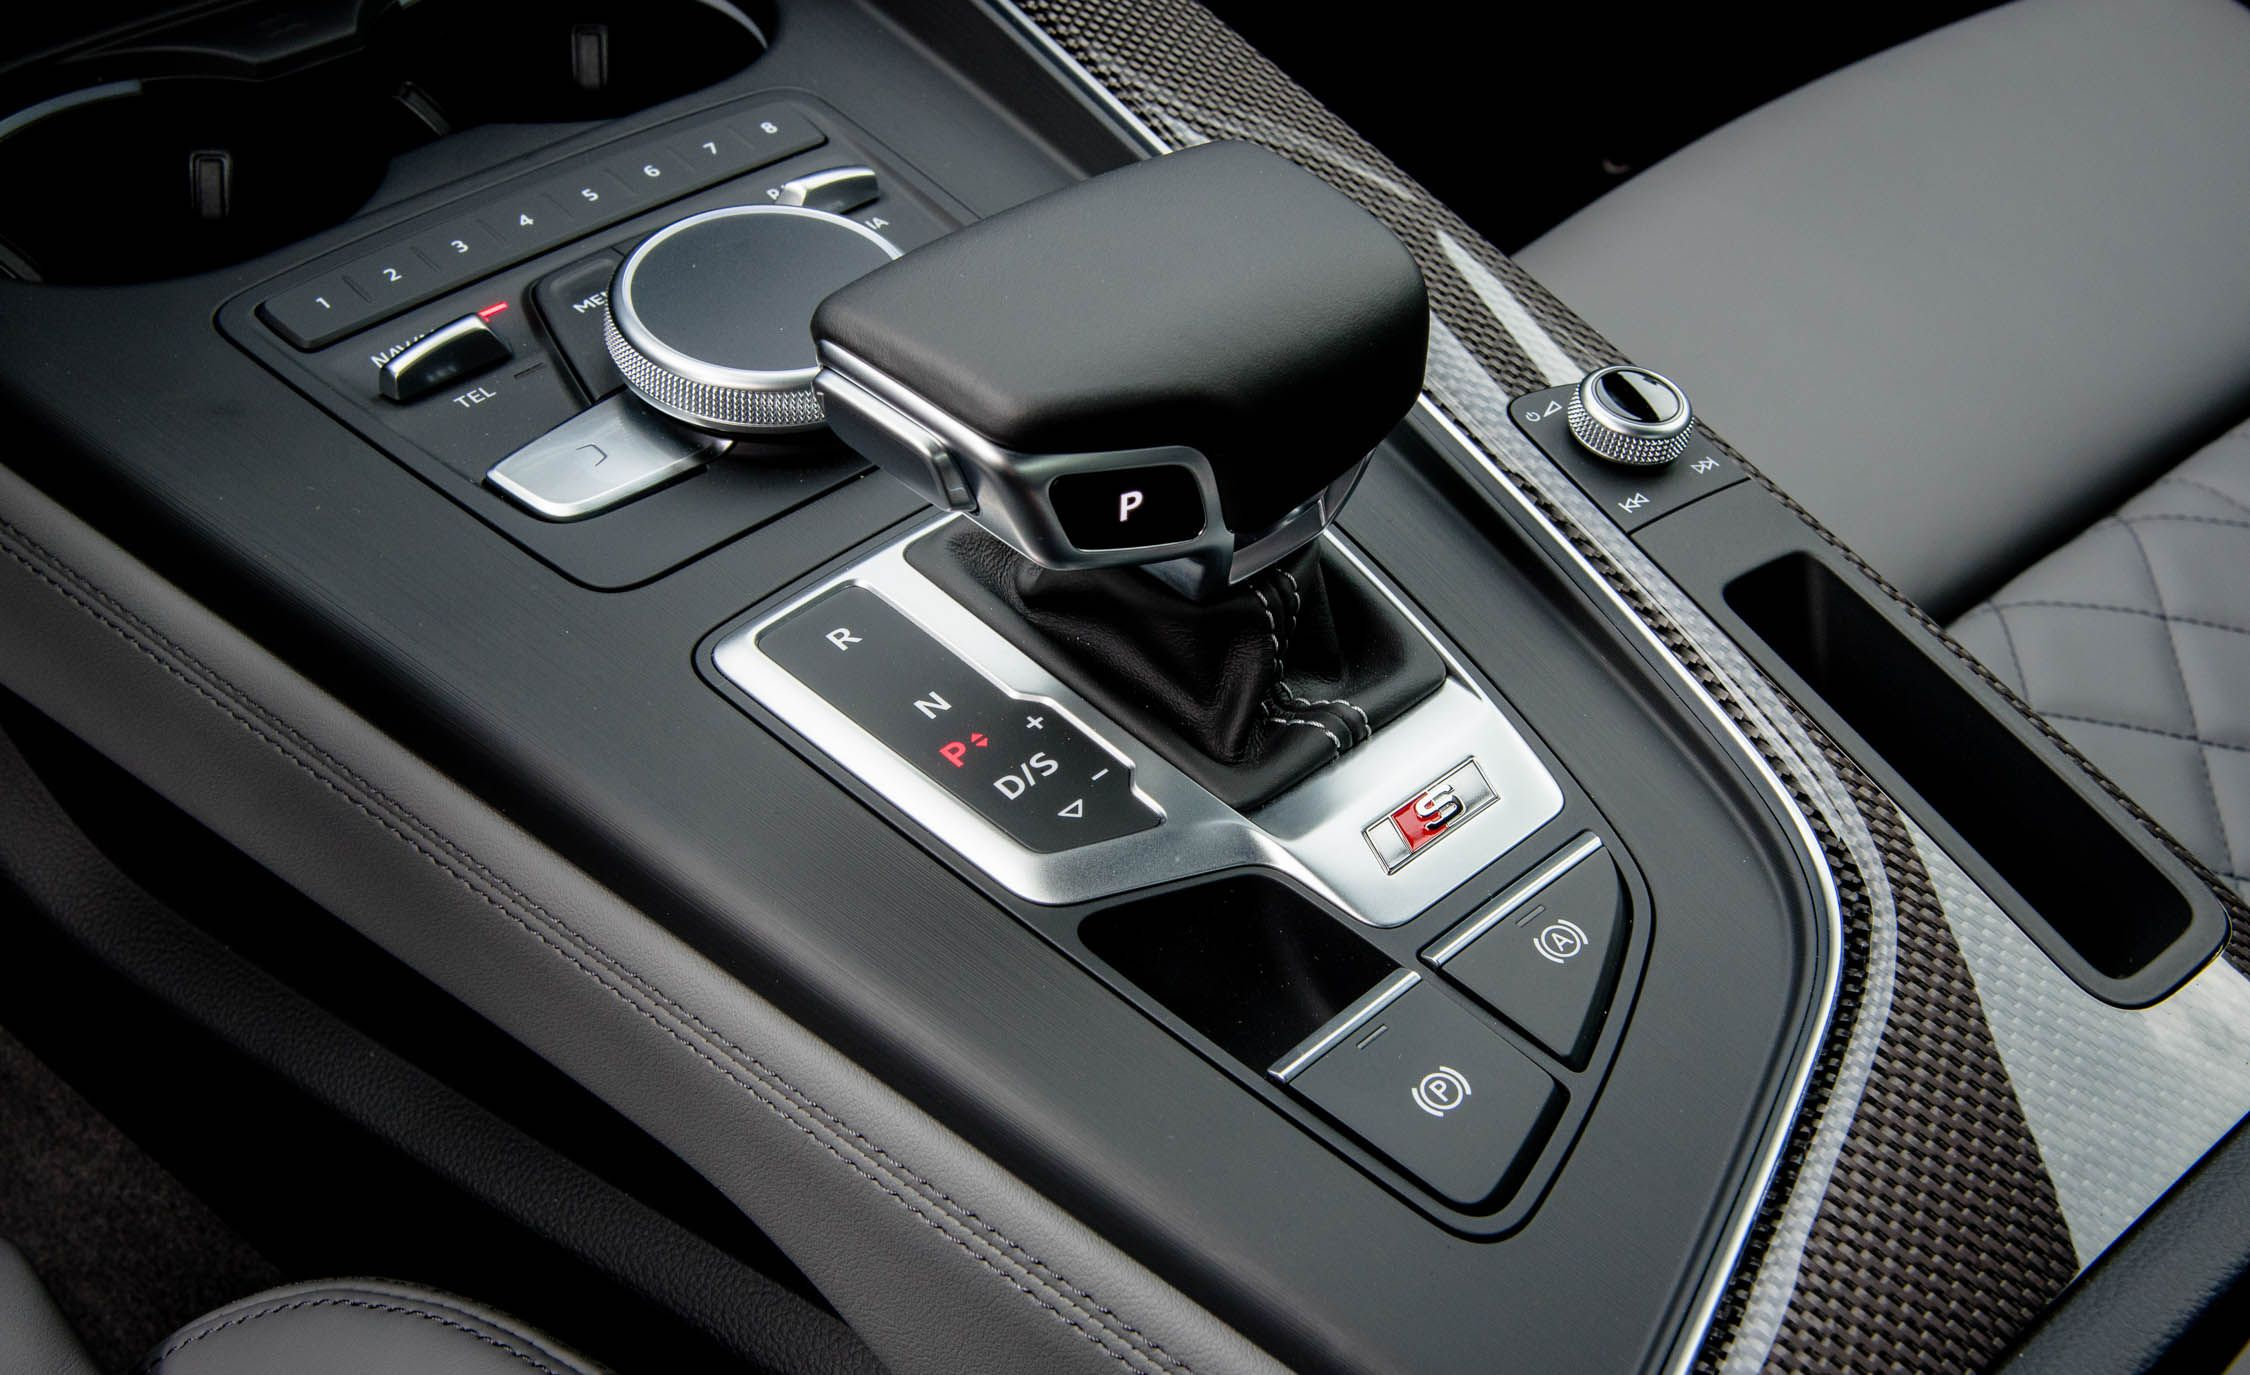 Audi S Reviews Audi S Price Photos And Specs Car And Driver - Audi car gear